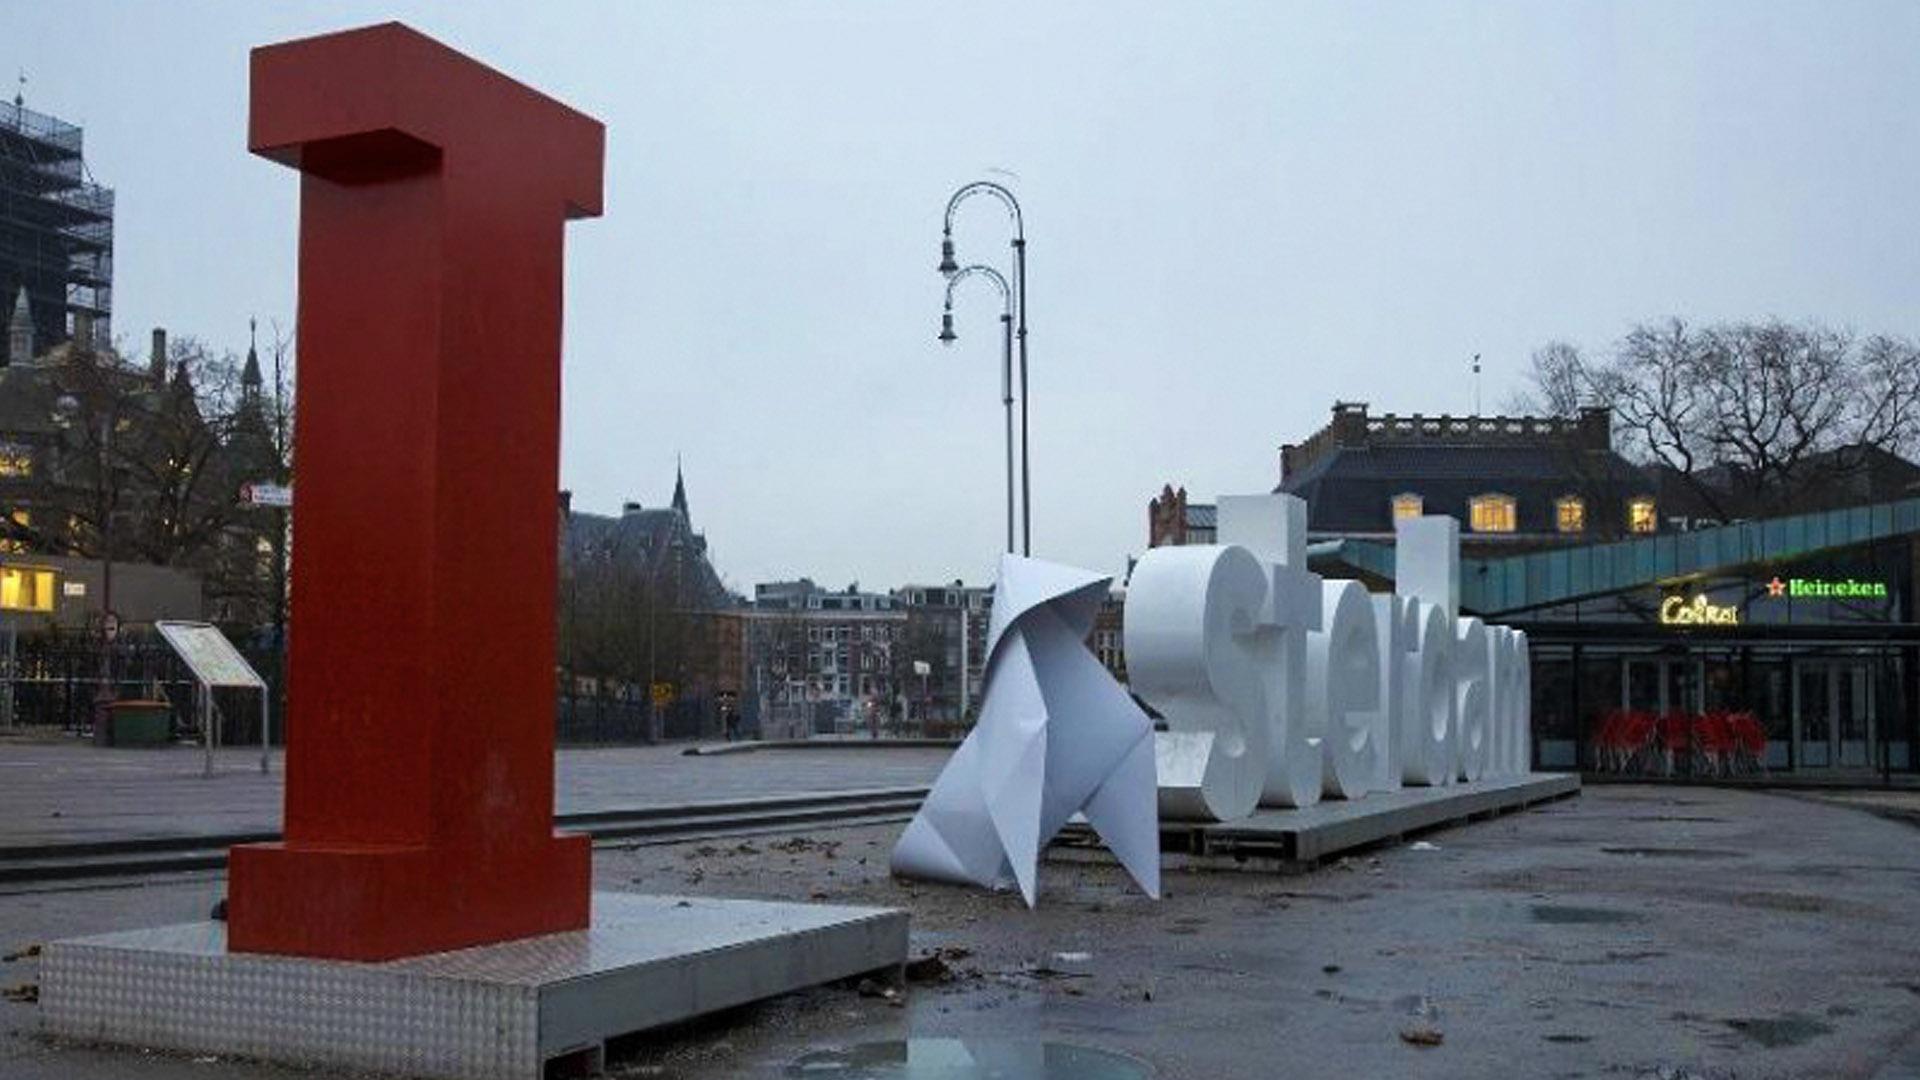 Playstation-Origami-I-Amsterdam-PR-marketing-stunt